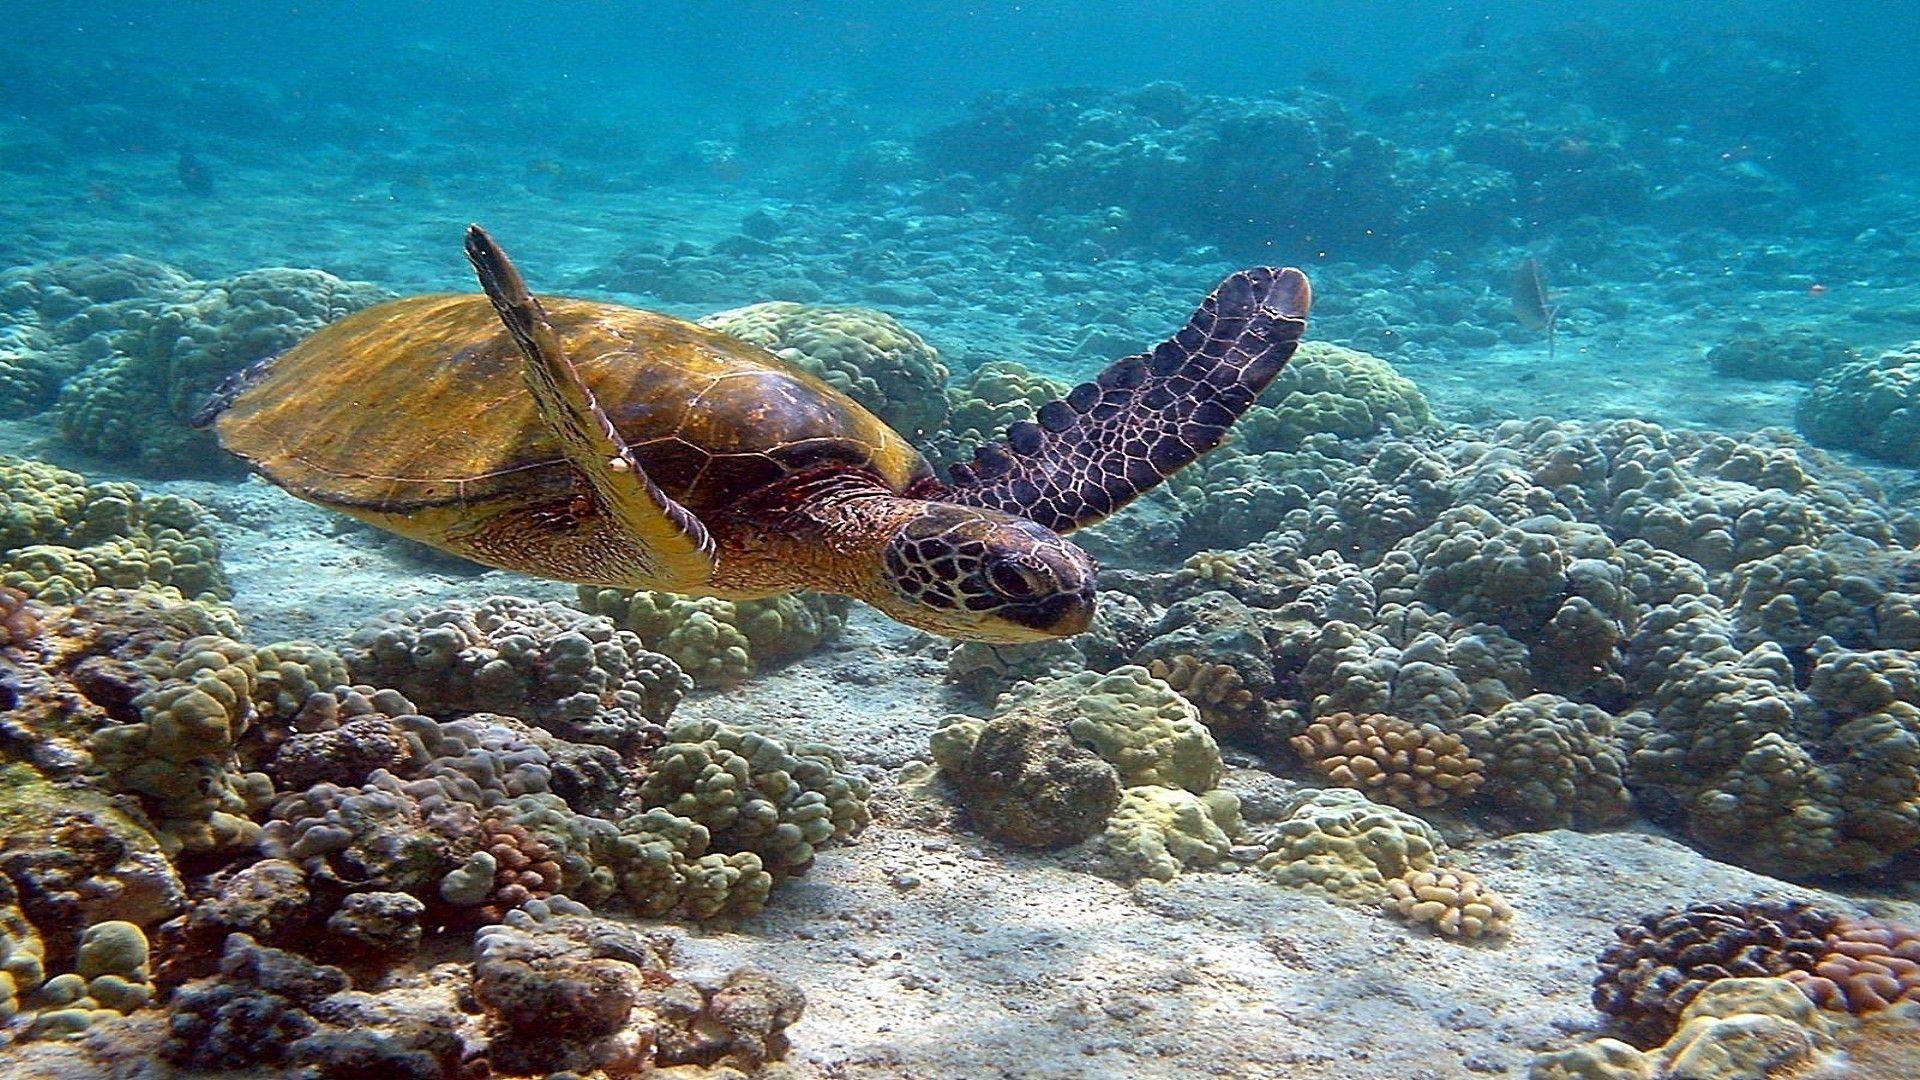 Sea Turtles In The Sea